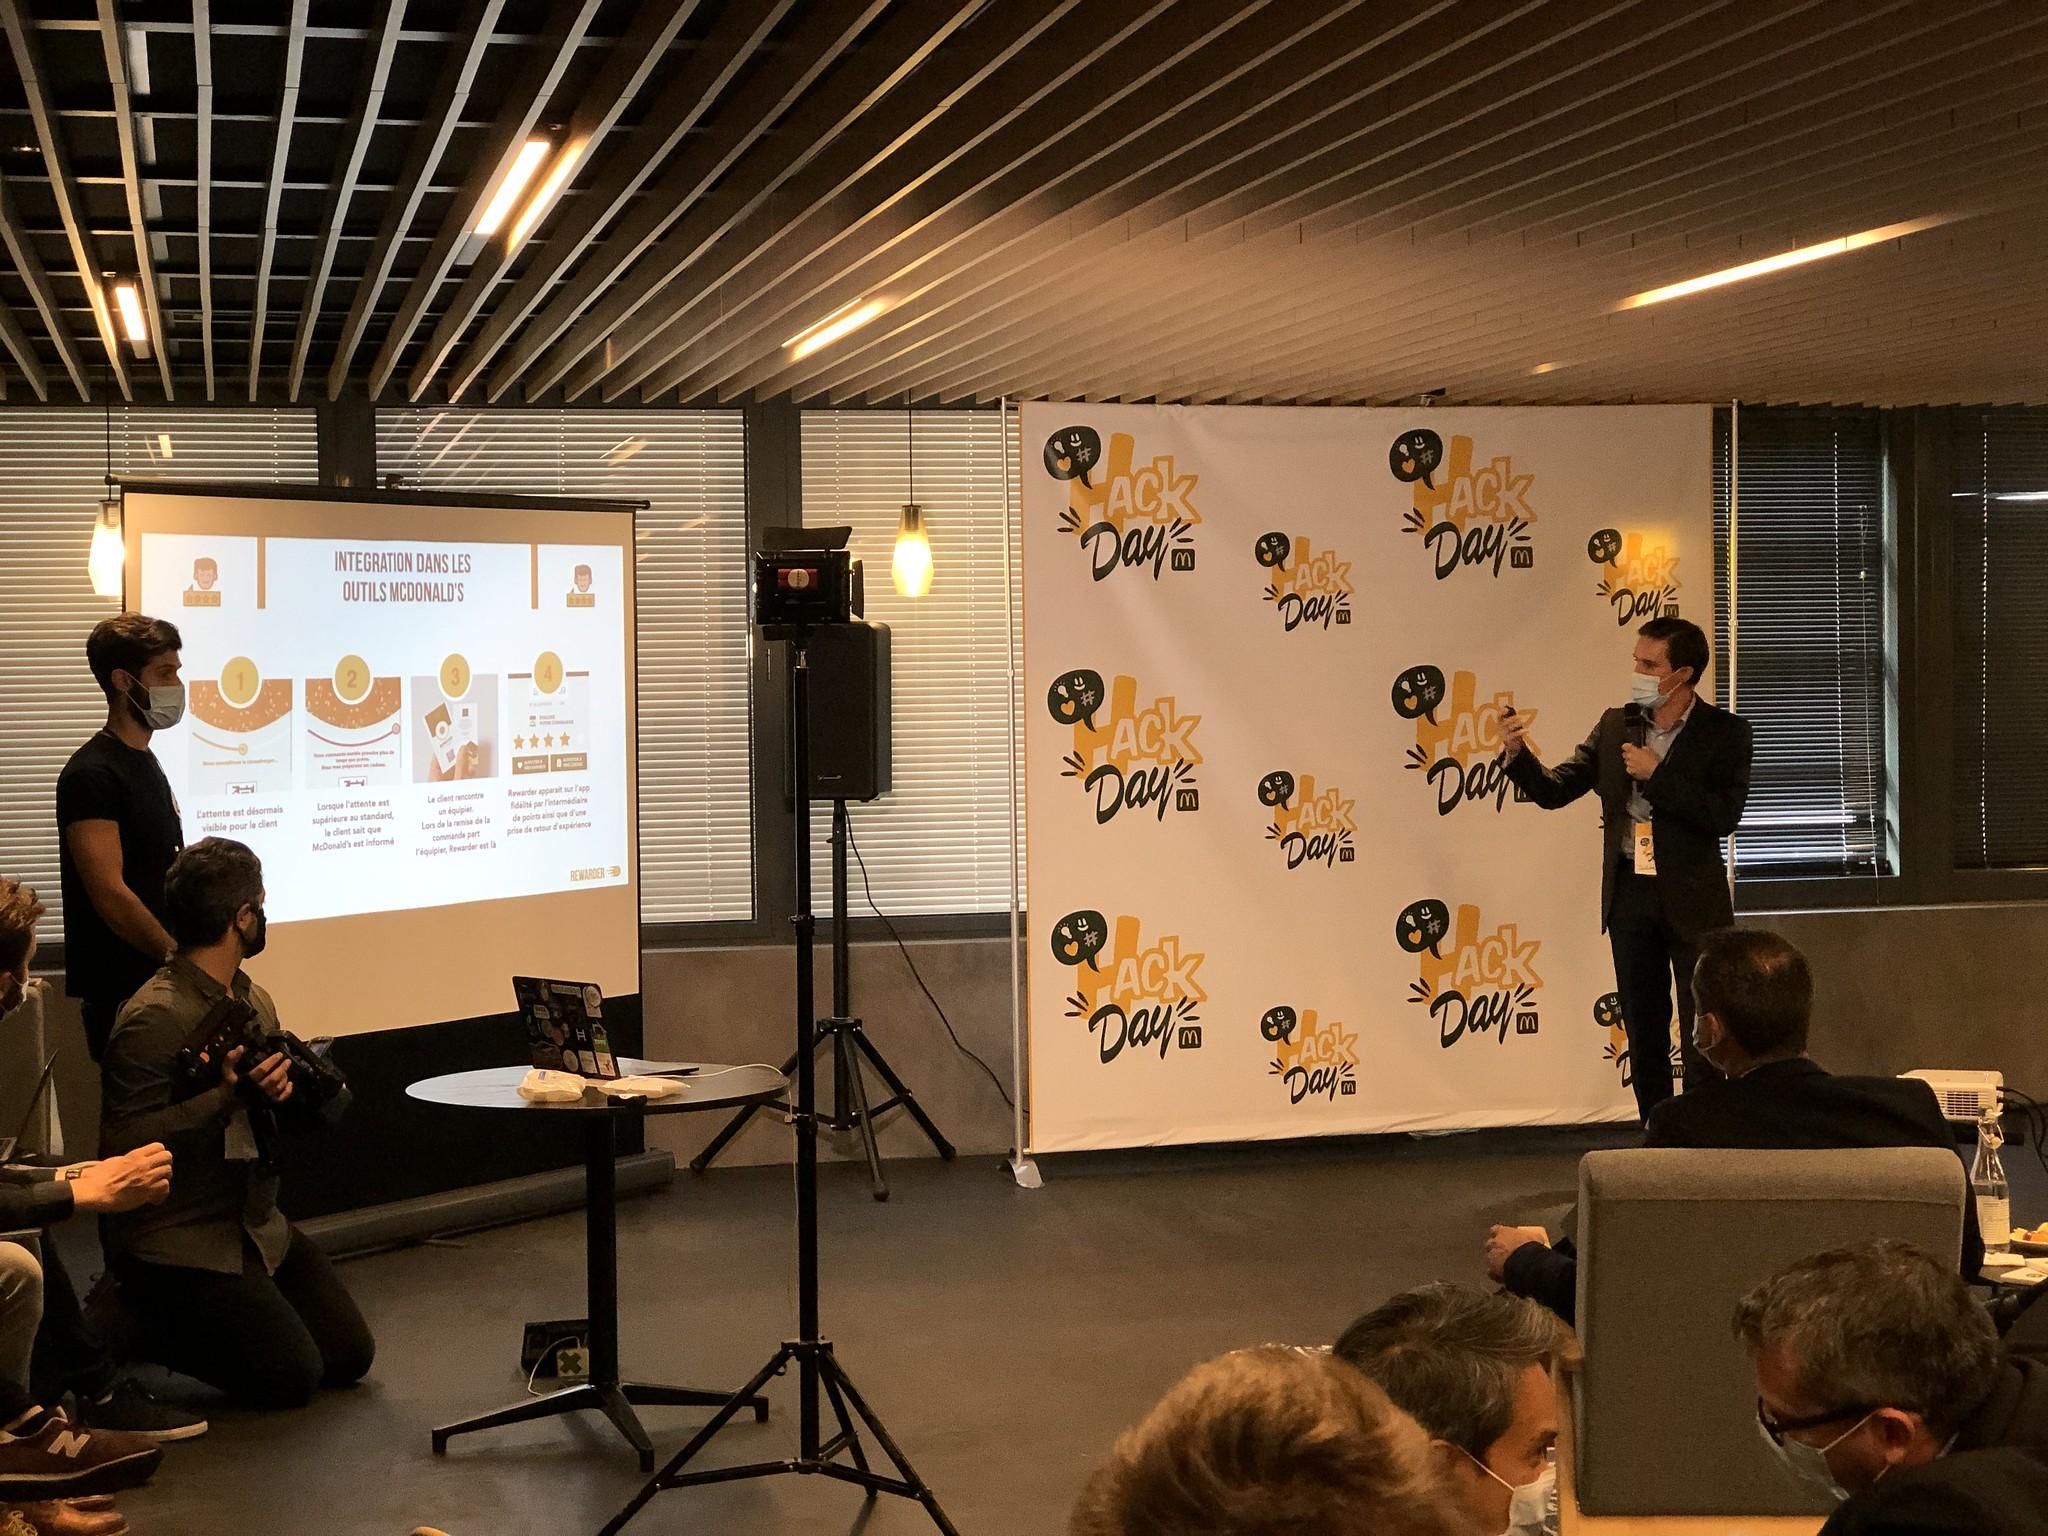 Presentation at Hack Day from BeMyApp